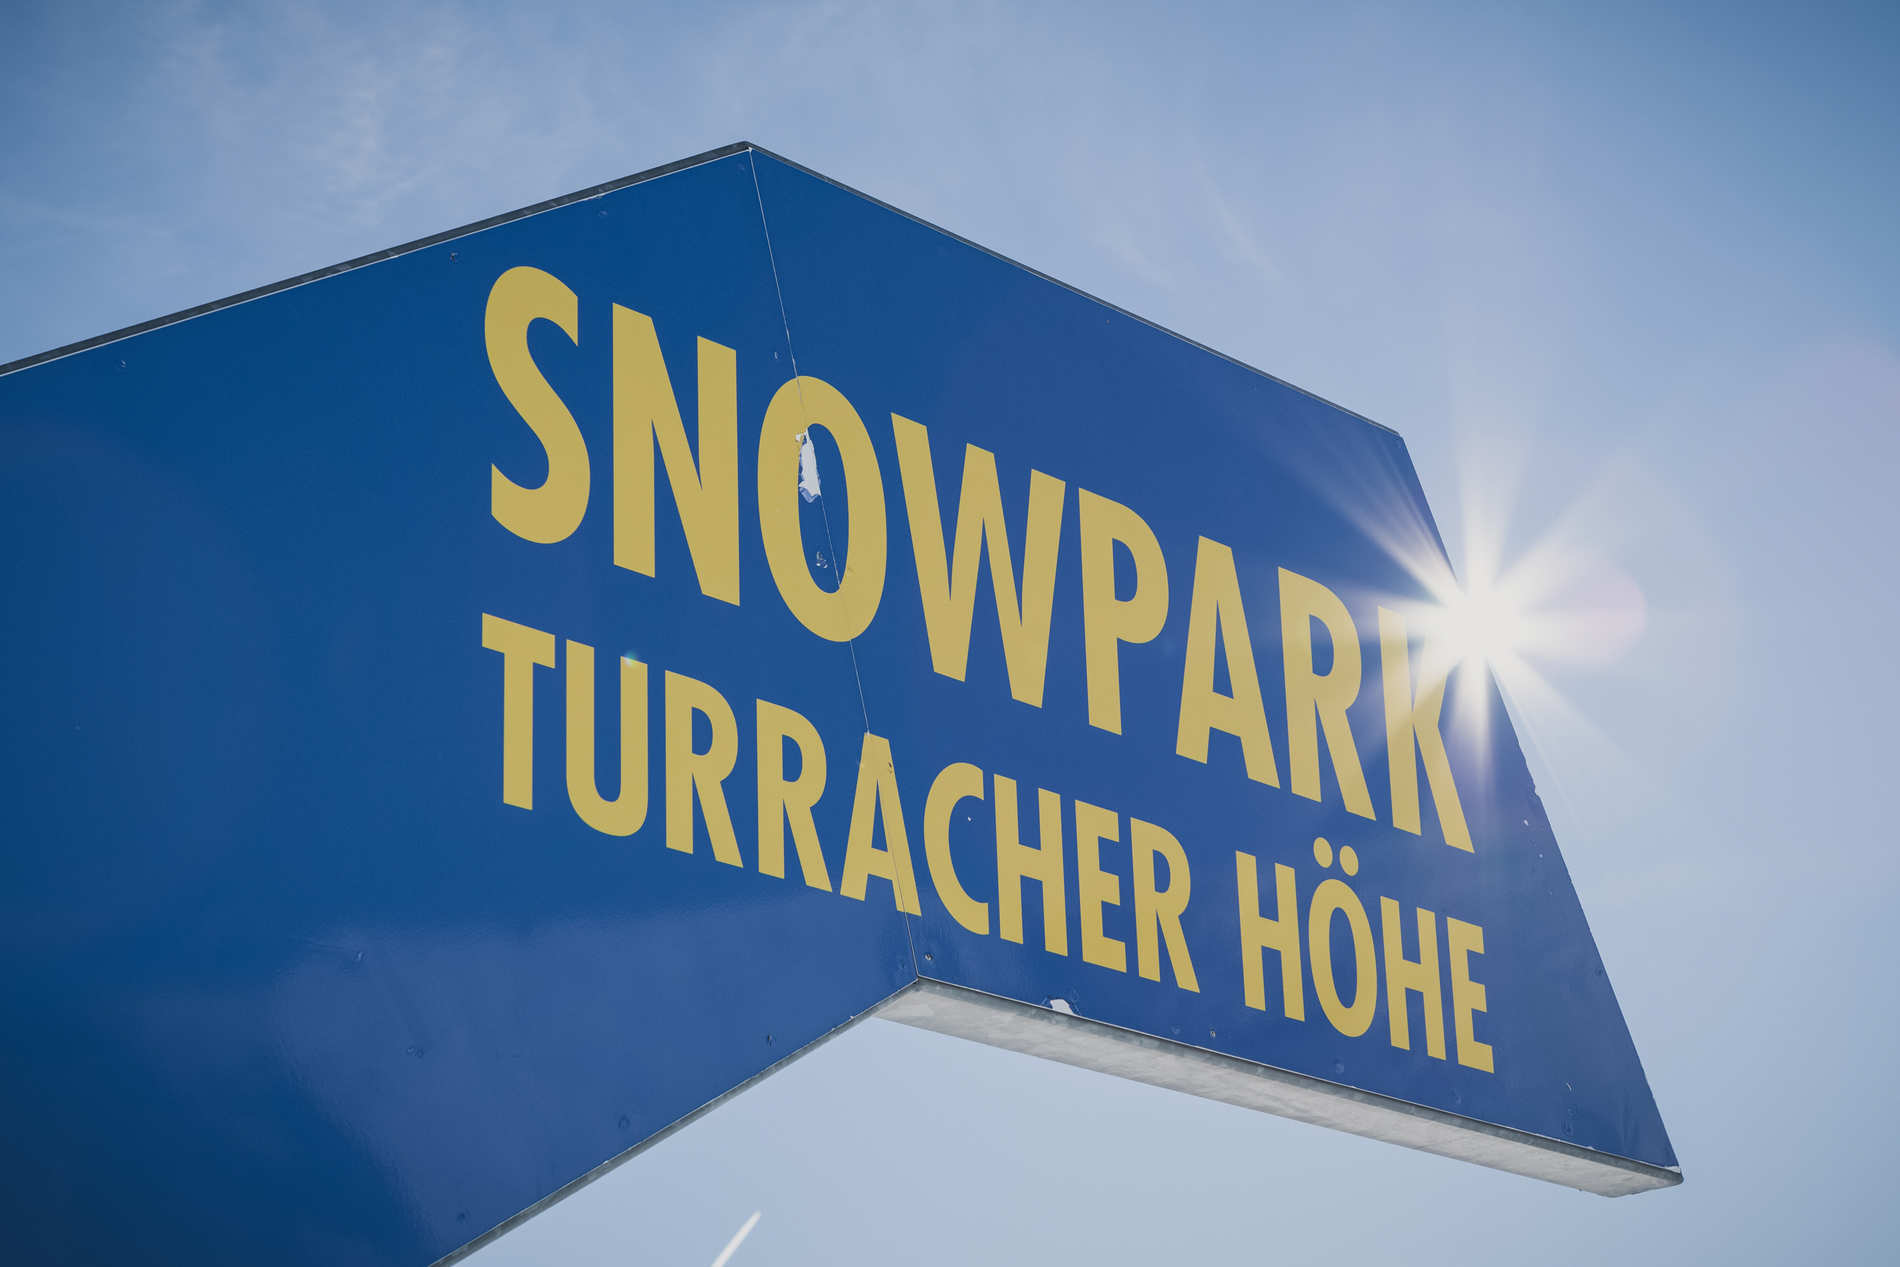 turracherhoehe 07 02 2019 scenic katjapokorn qparks 04